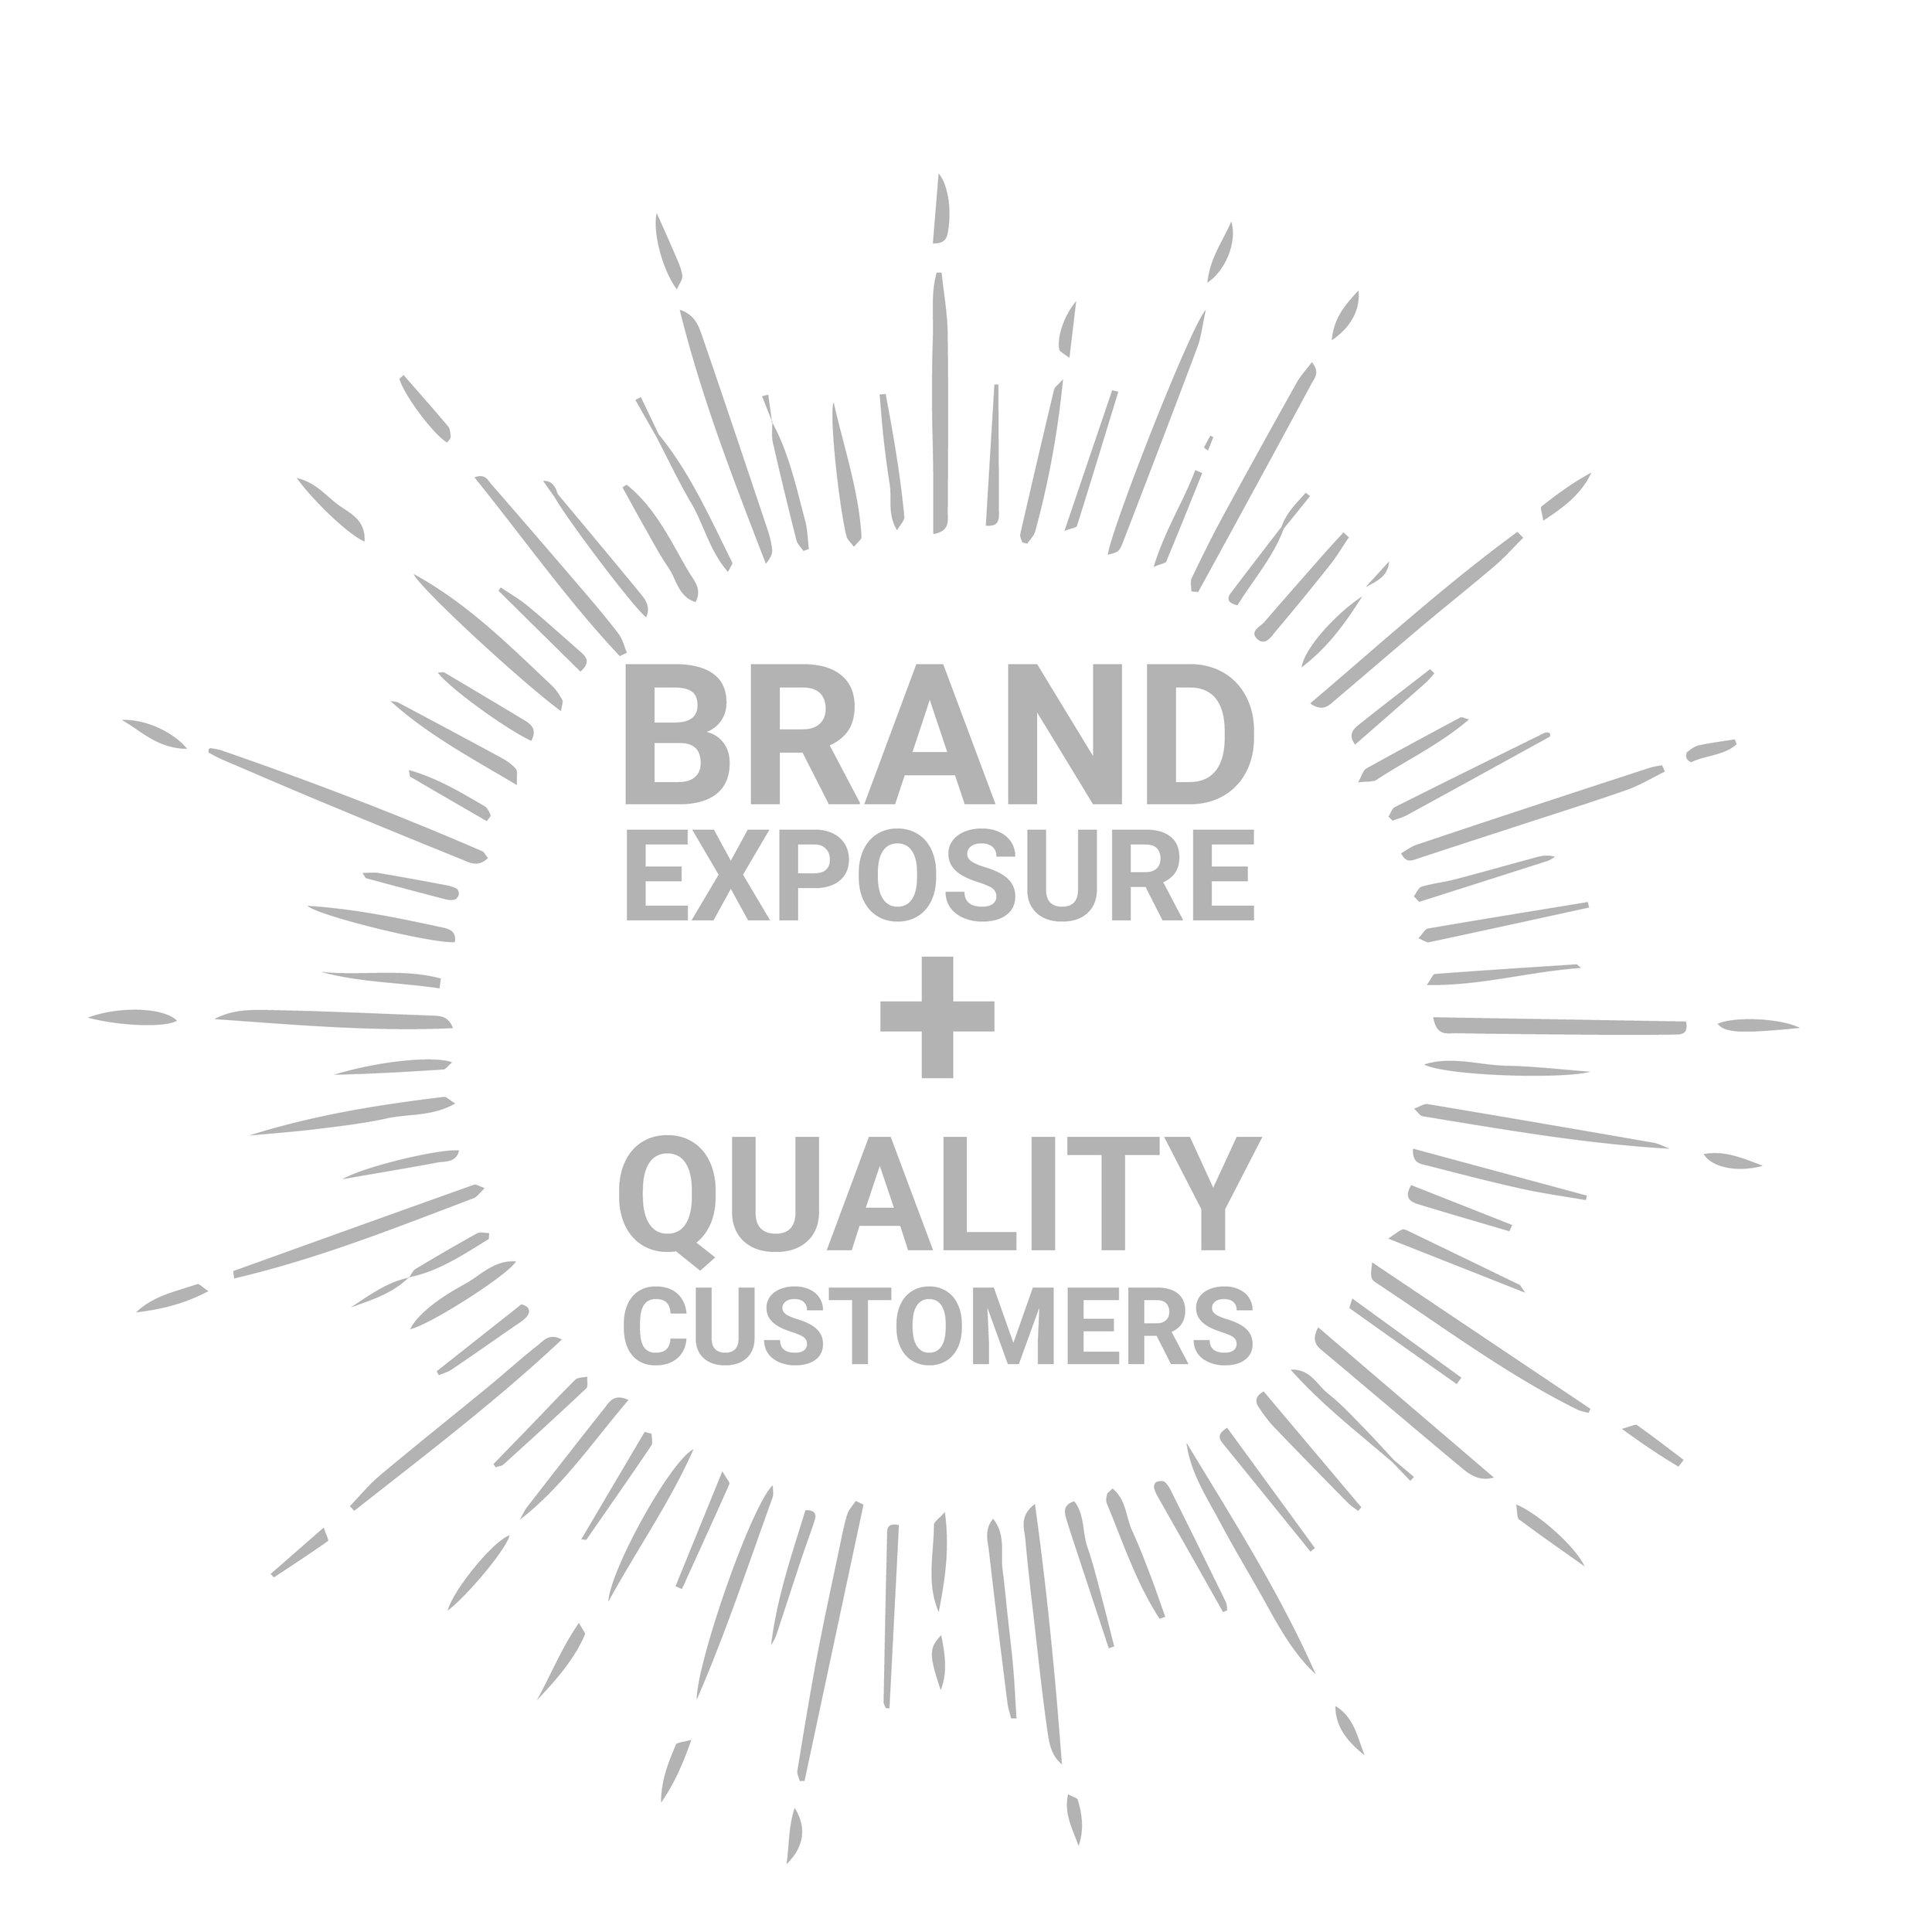 brand-exposure-quality-customers